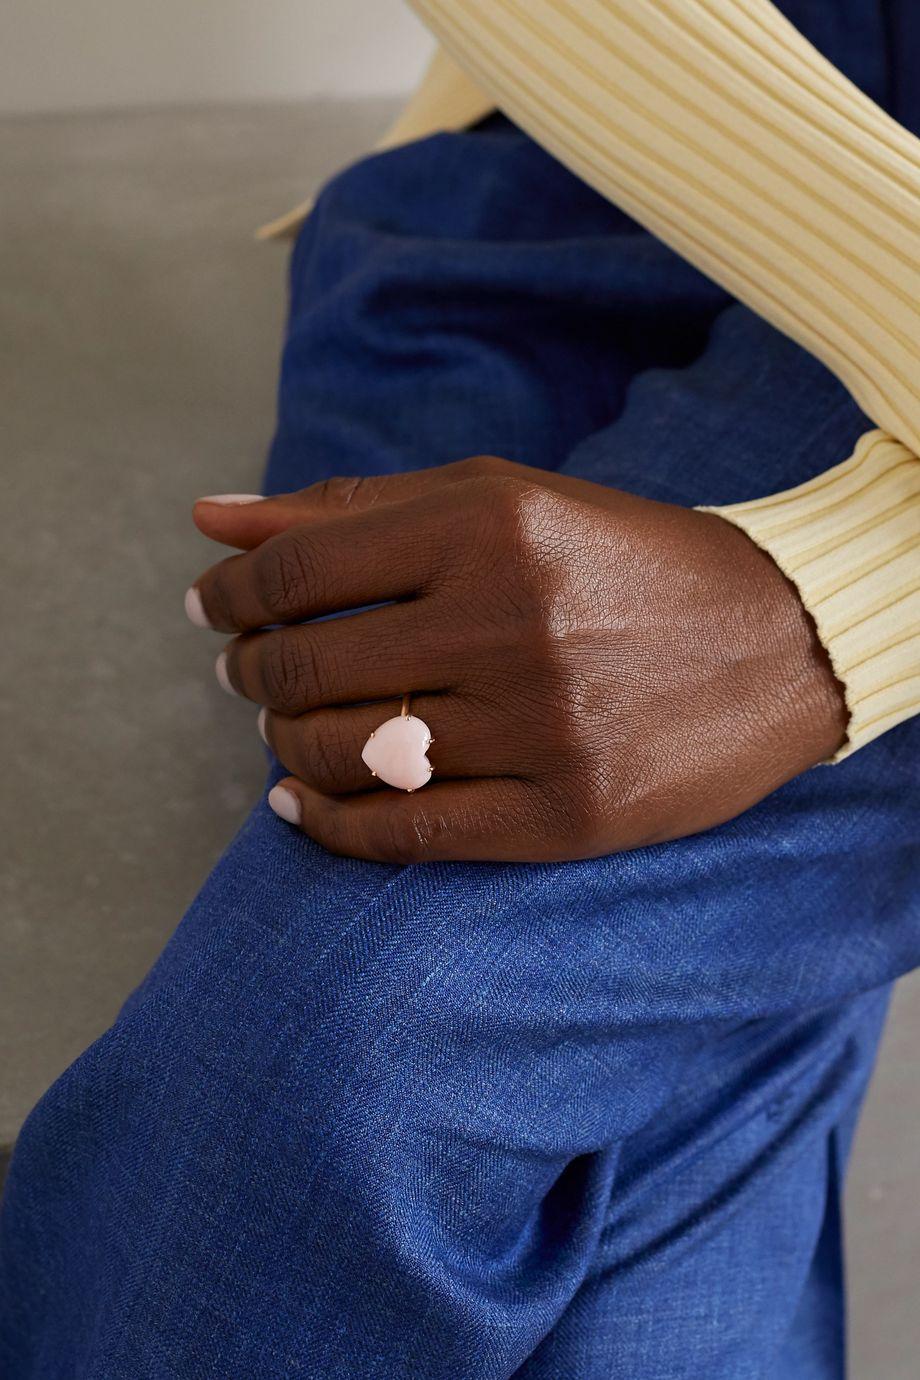 Irene Neuwirth Love 18-karat rose gold opal ring